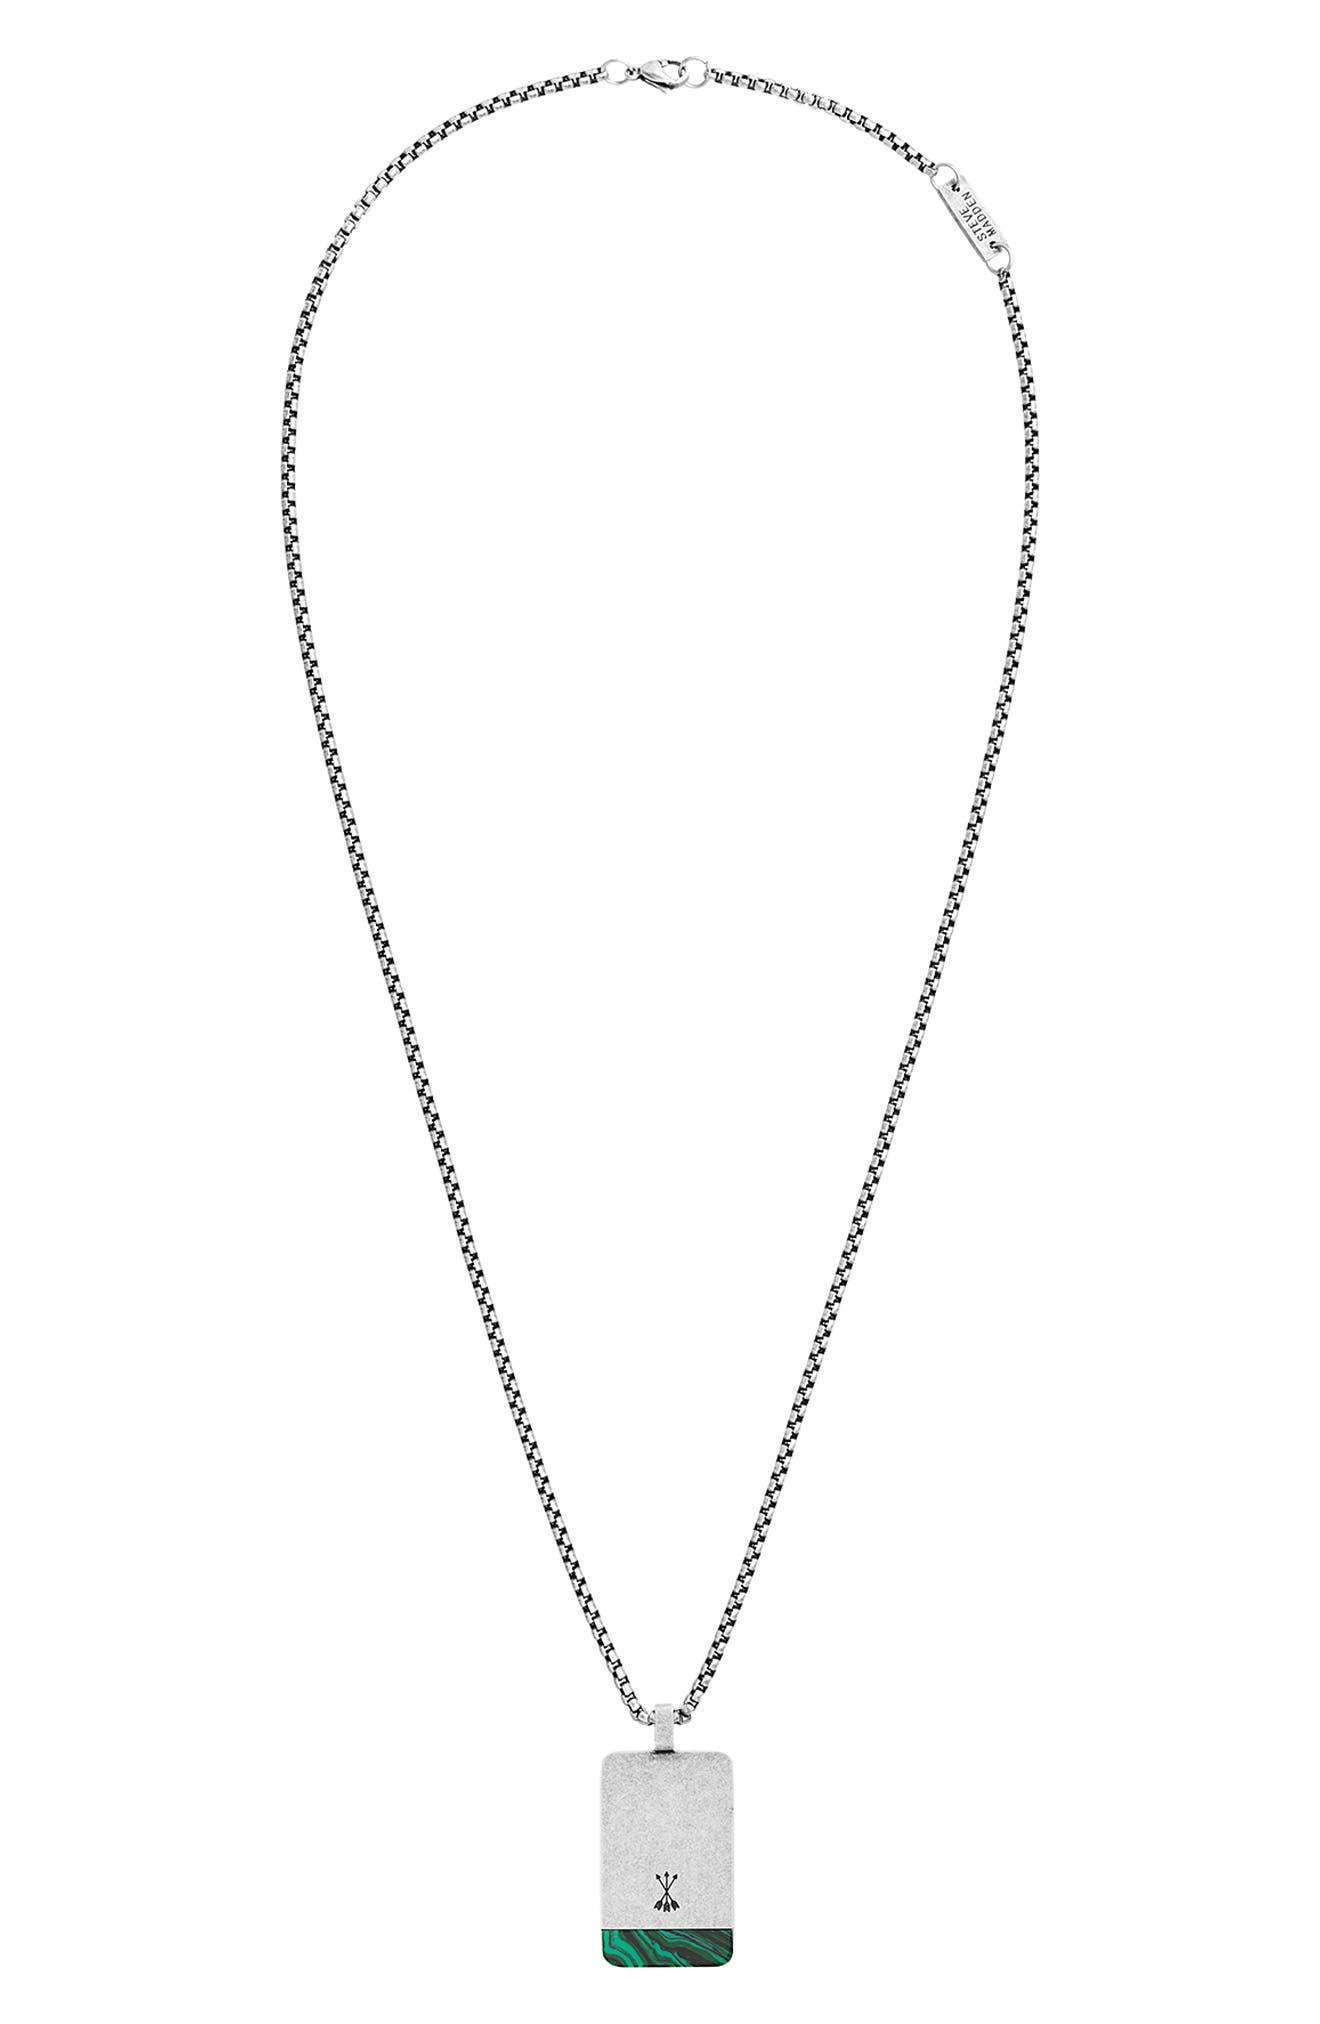 Dogtag Pendant Necklace,                             Main thumbnail 1, color,                             GREEN/ SILVER